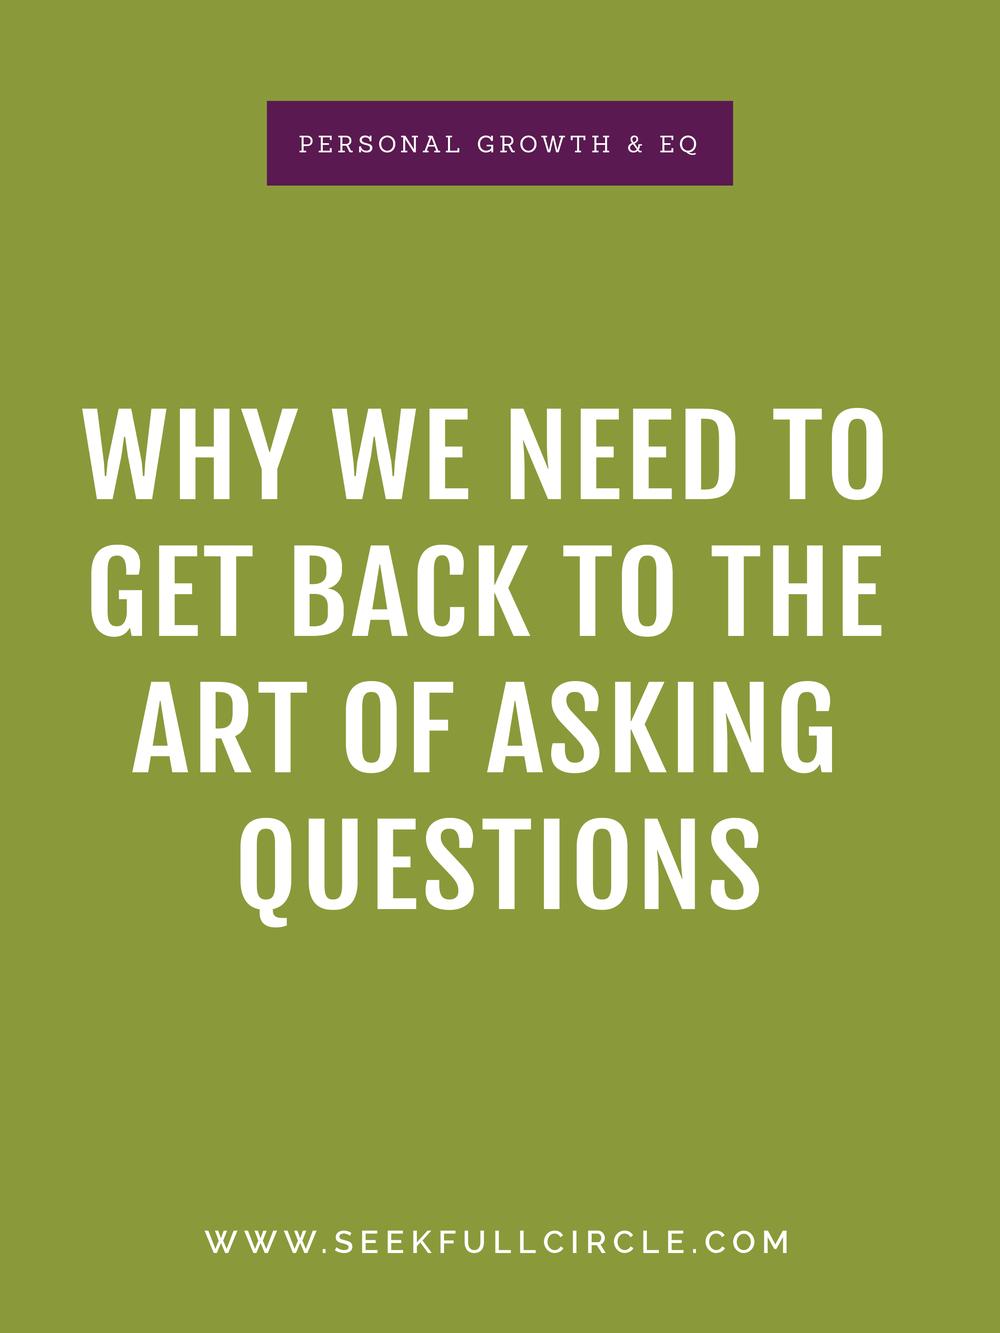 Kim Waltman Seek Full Circle Art of Asking Questions